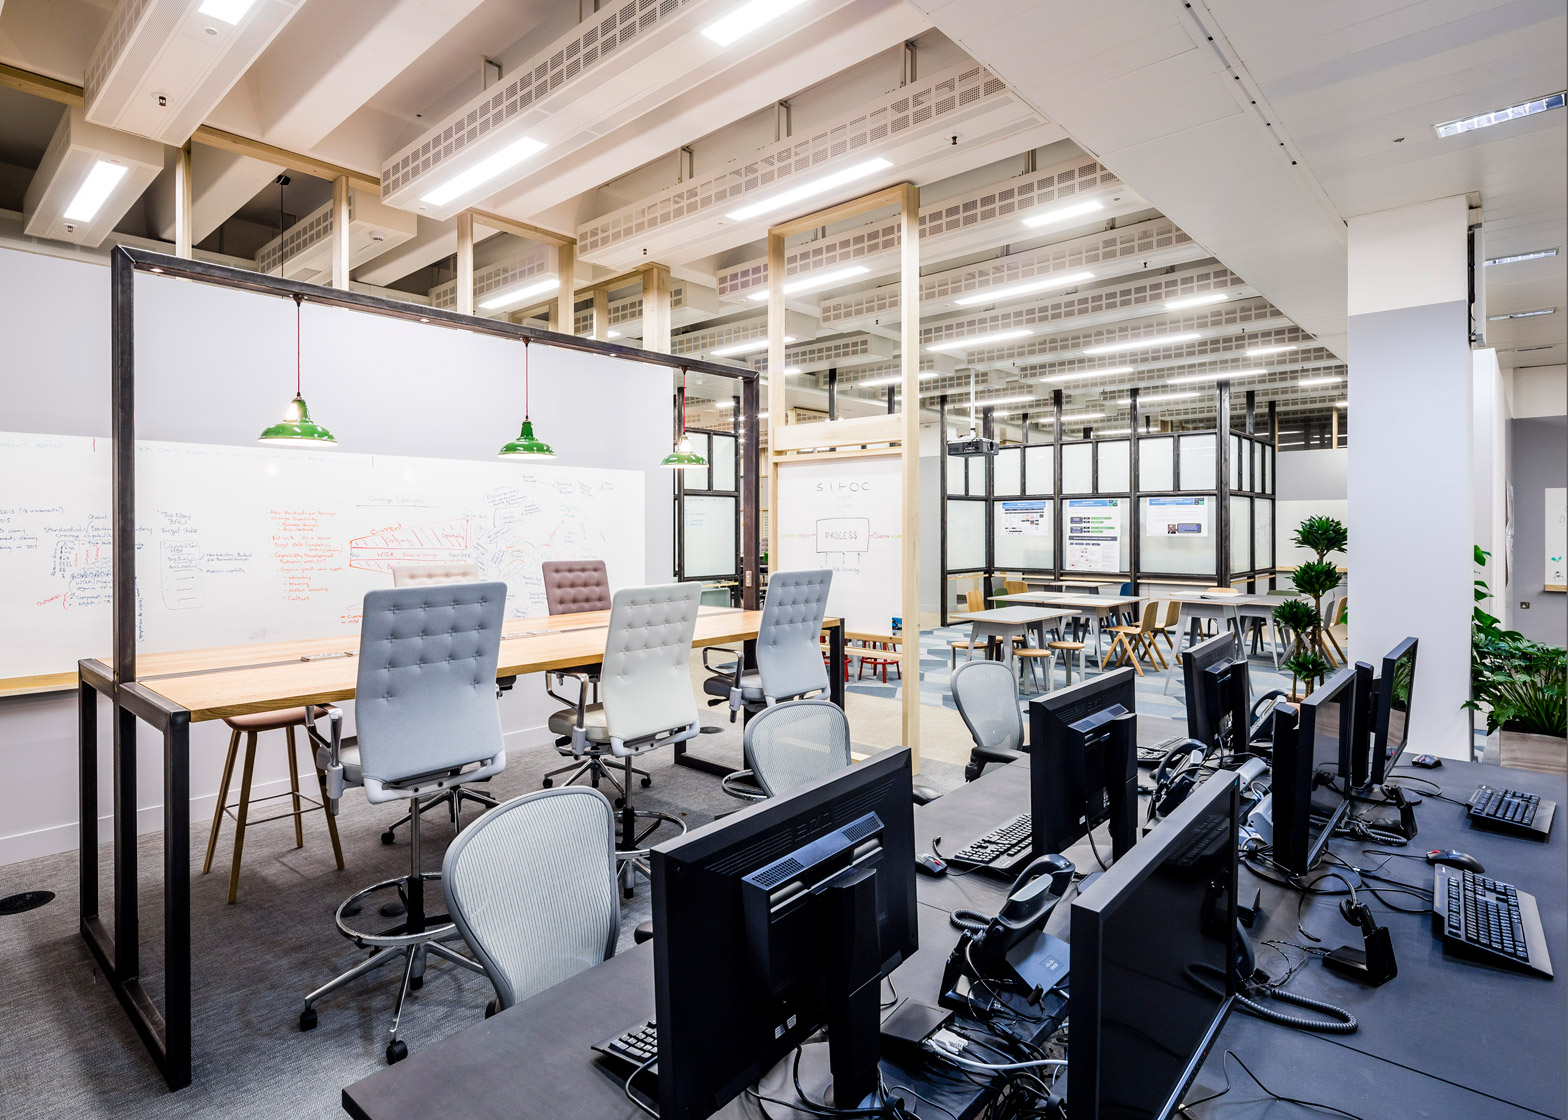 barclaycard-agile-workplace-APA-london-interior-design_dezeen_1568_11